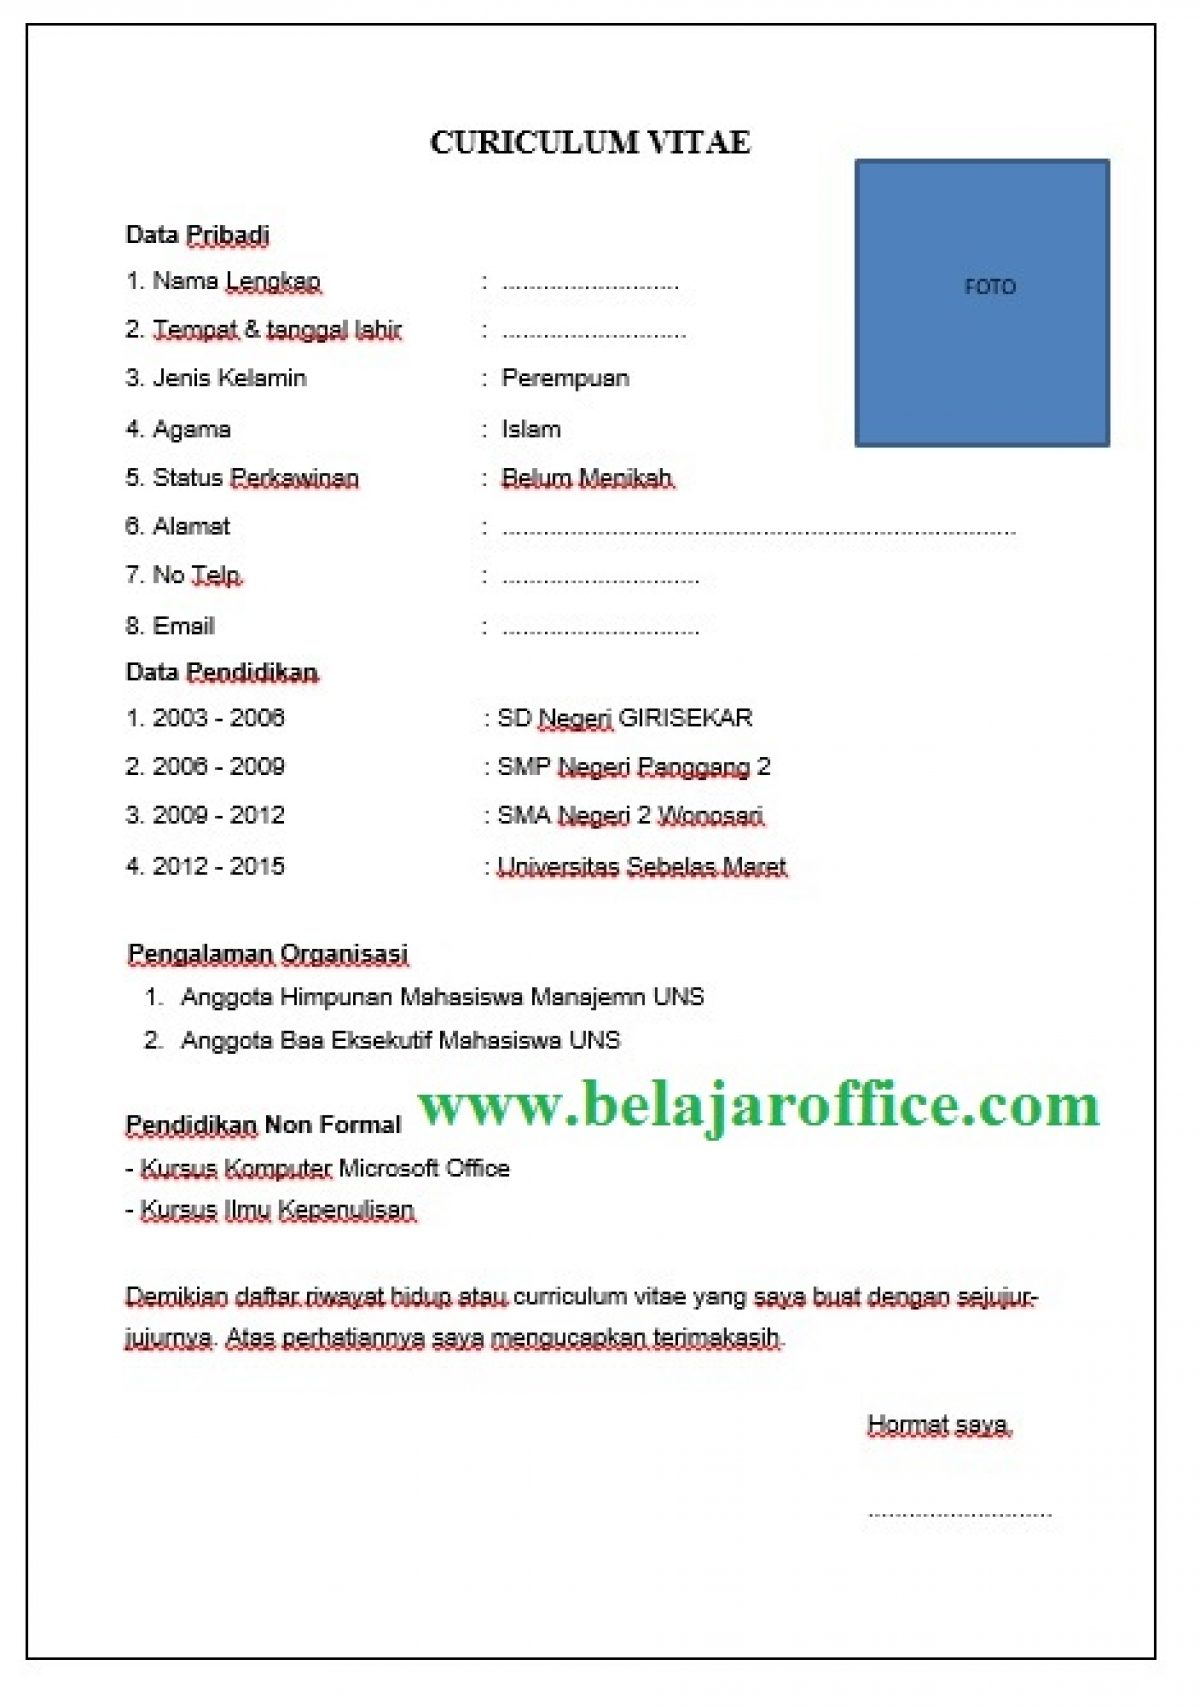 Contoh Penulisan Cv Curiculum Vitae Untuk Fress Graduate Belajar Office